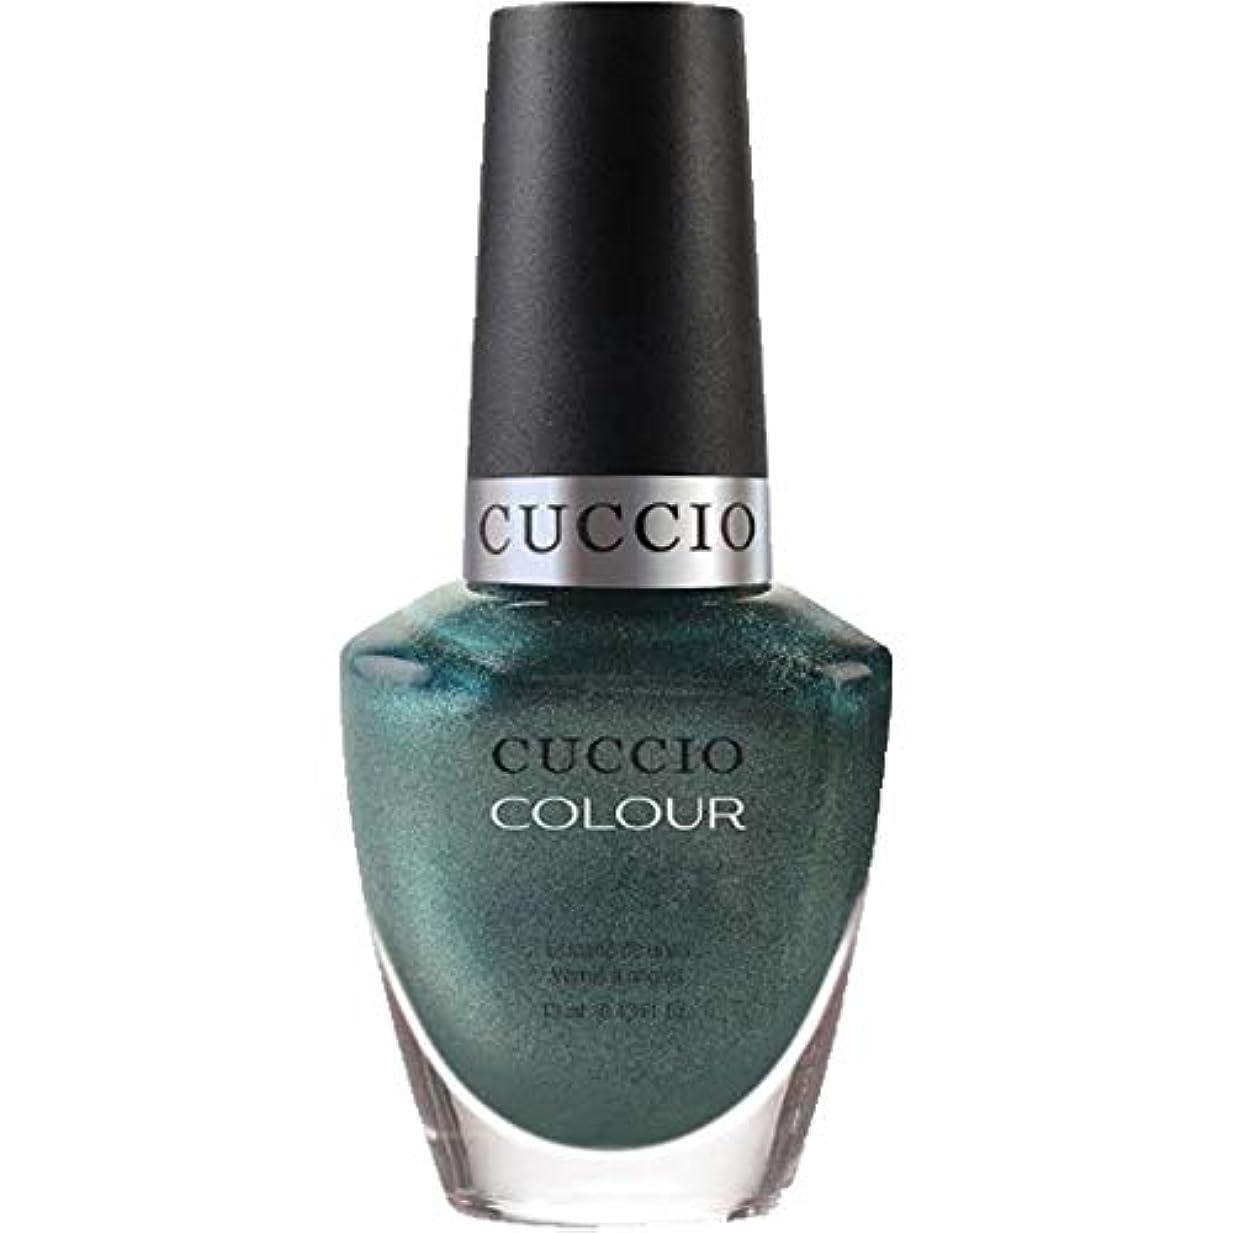 迷彩適度な所有者Cuccio Colour Gloss Lacquer - Notorious - 0.43oz / 13ml